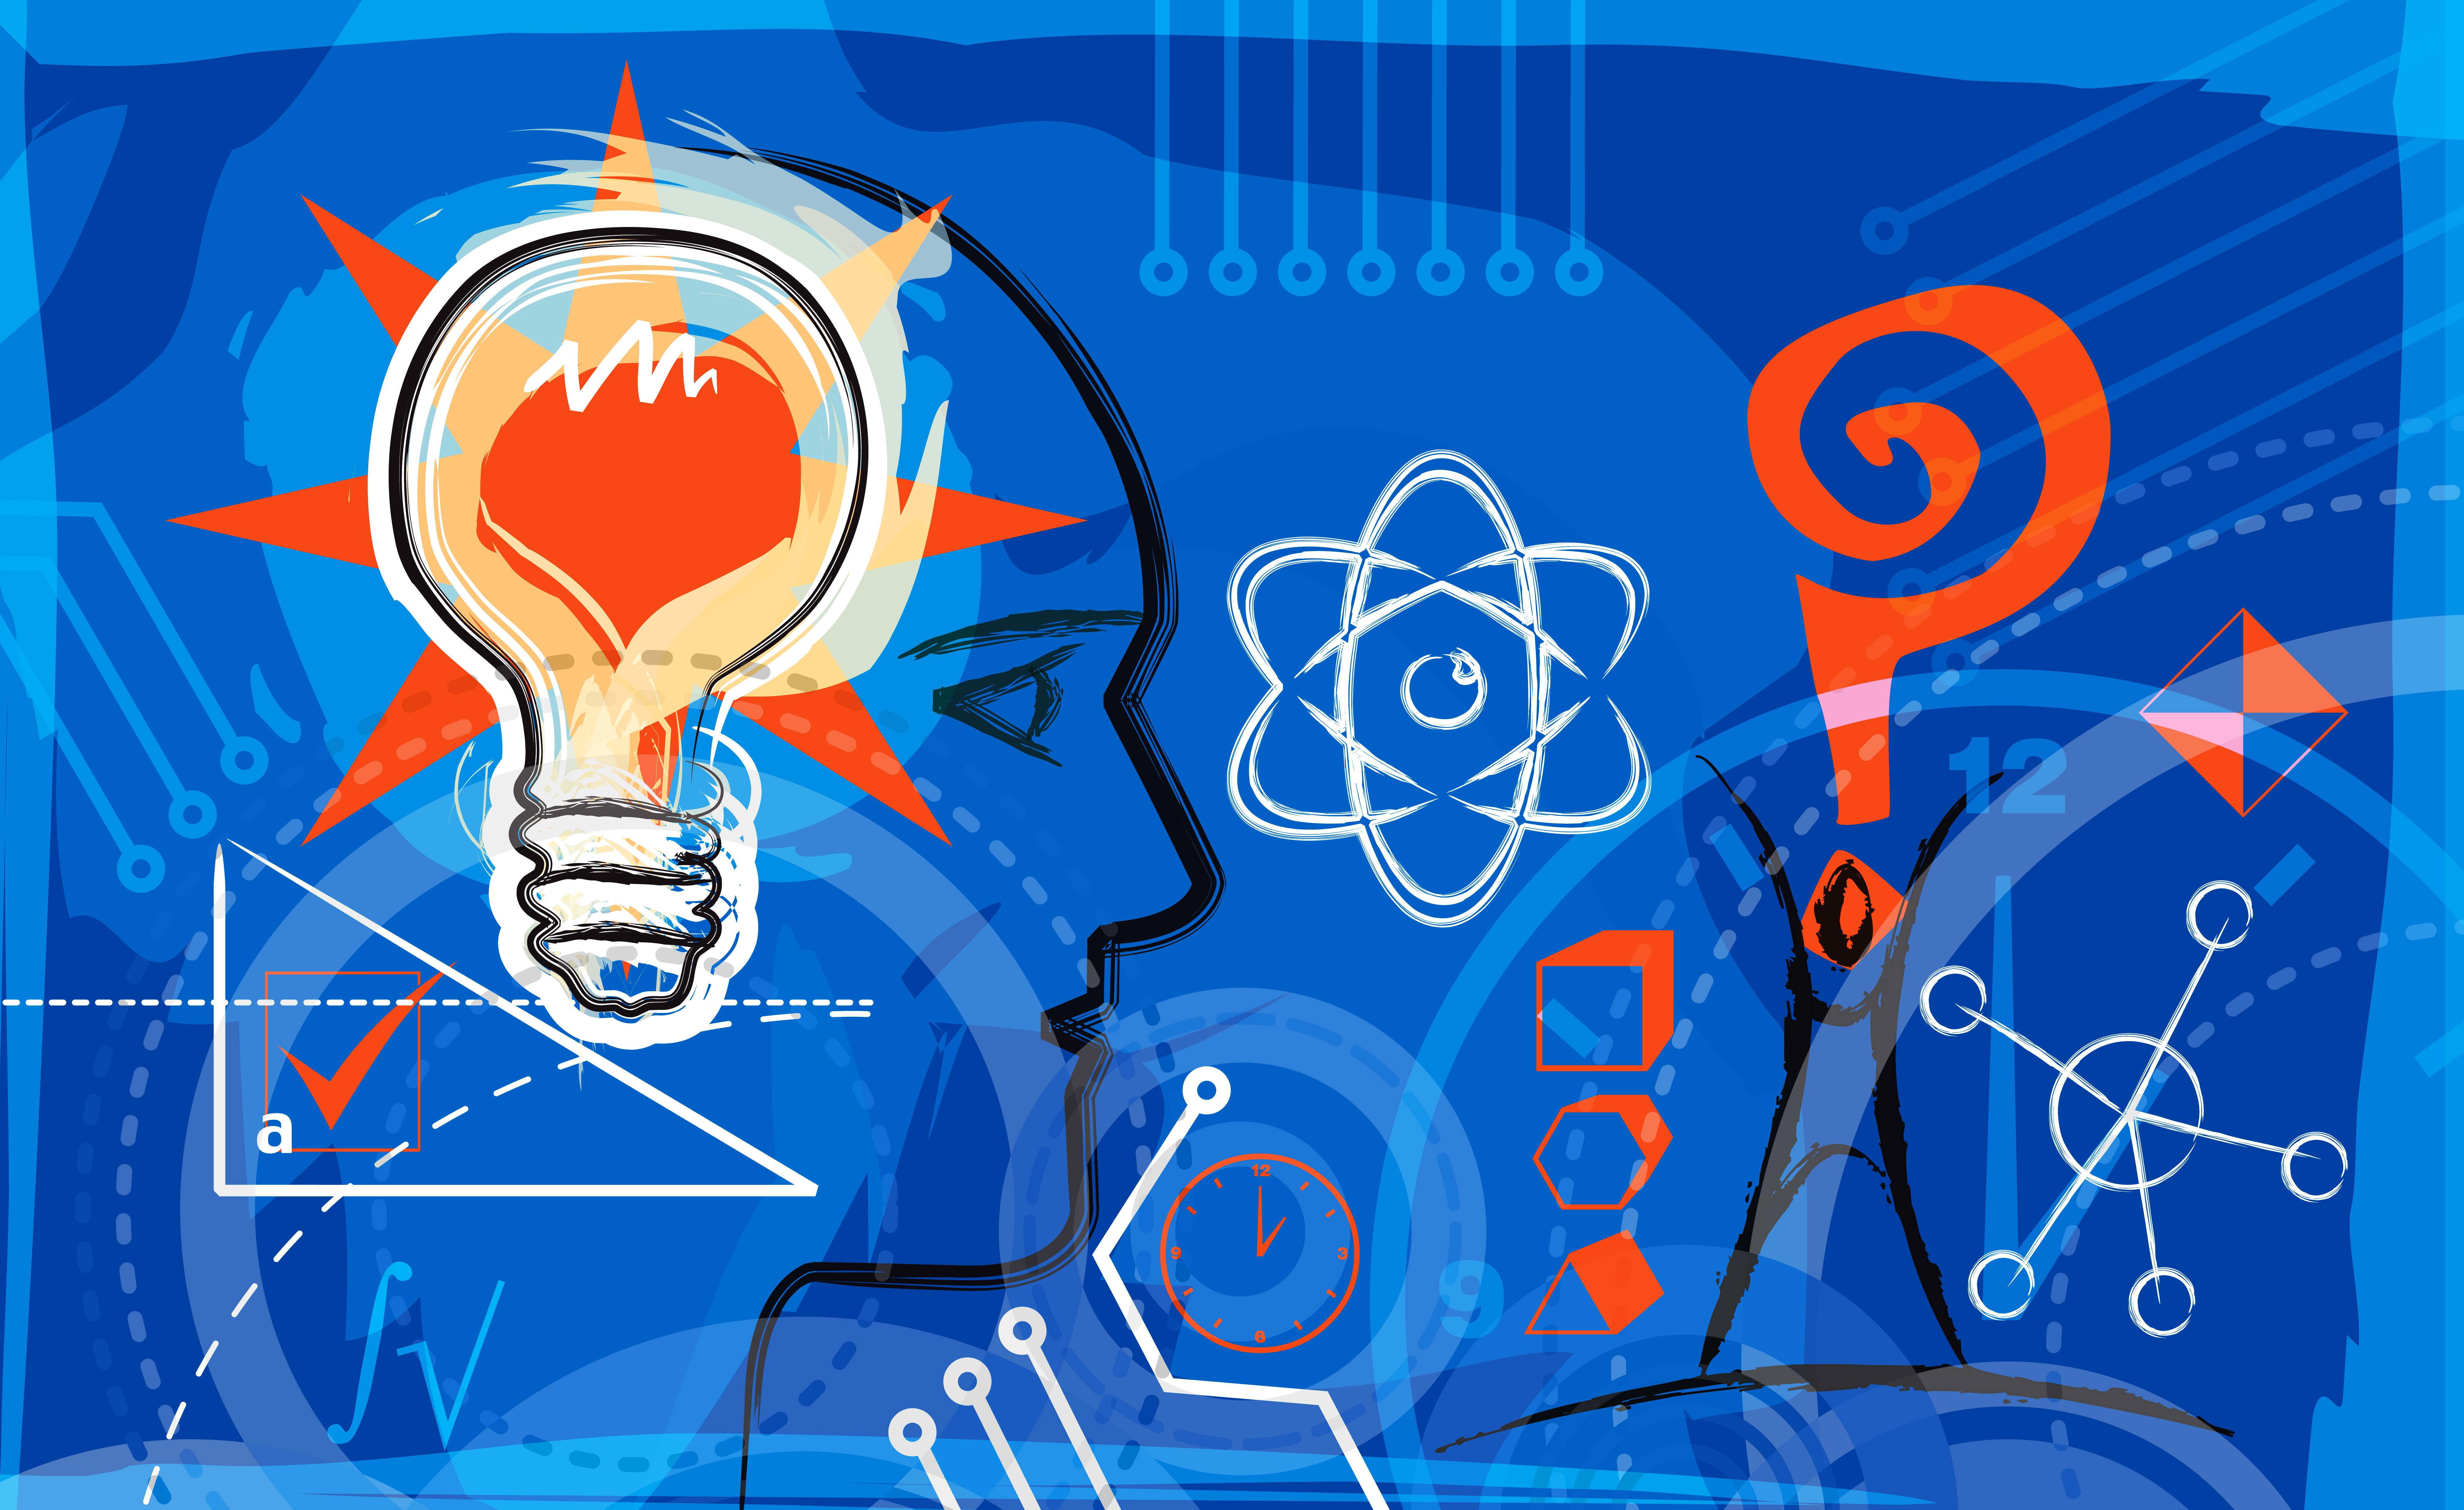 Creative knowledge illustration